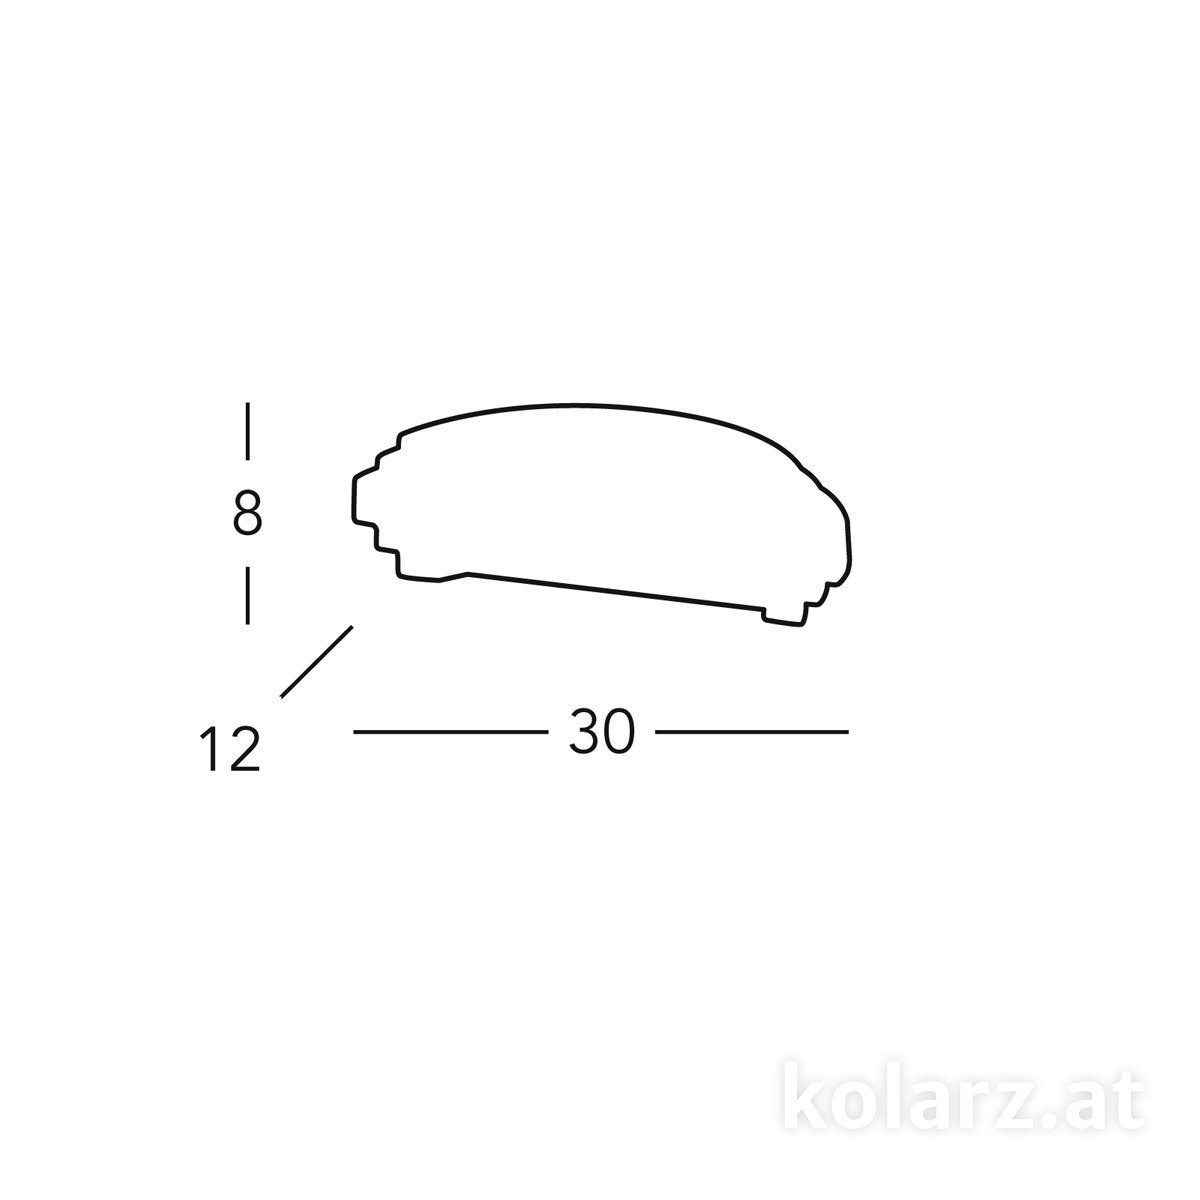 0290-61-s1.jpg